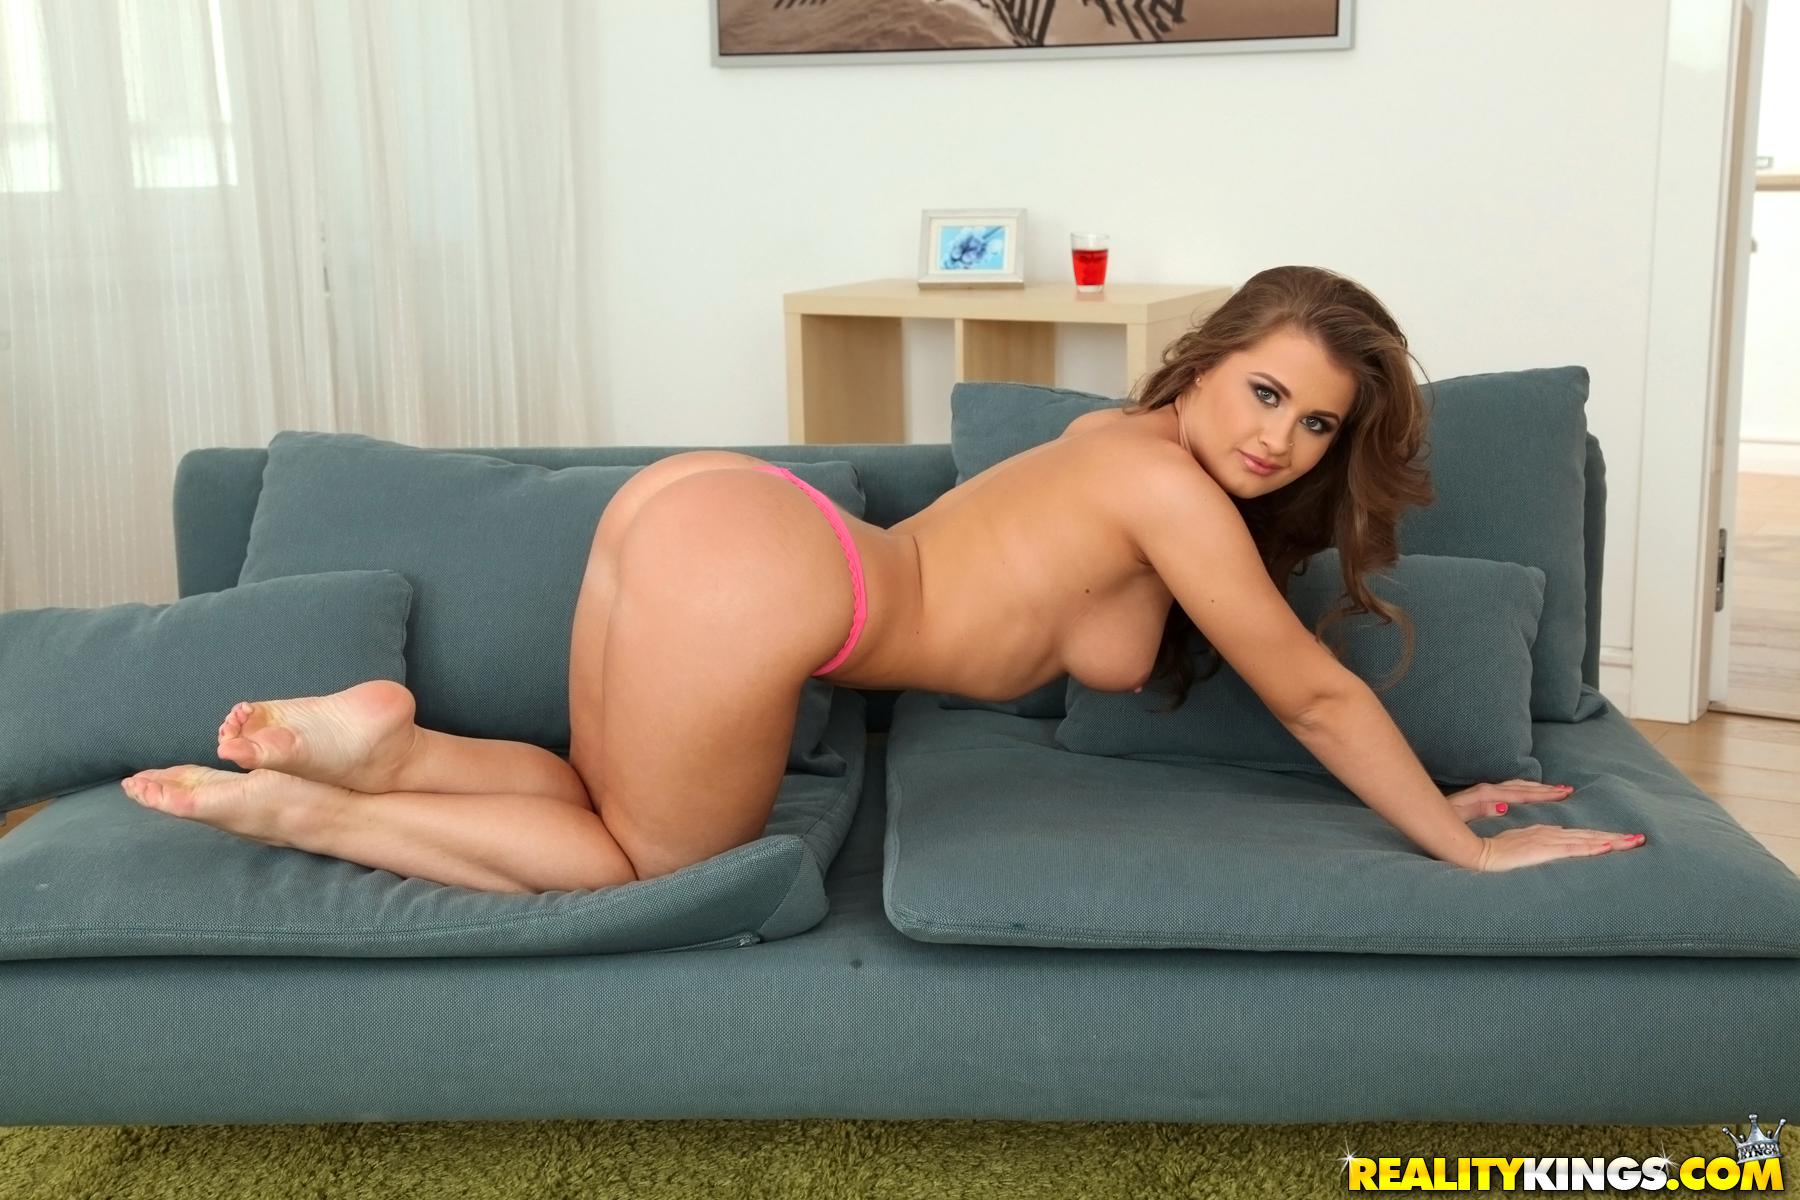 Giselle gomez rolon hembra caliente - 4 2